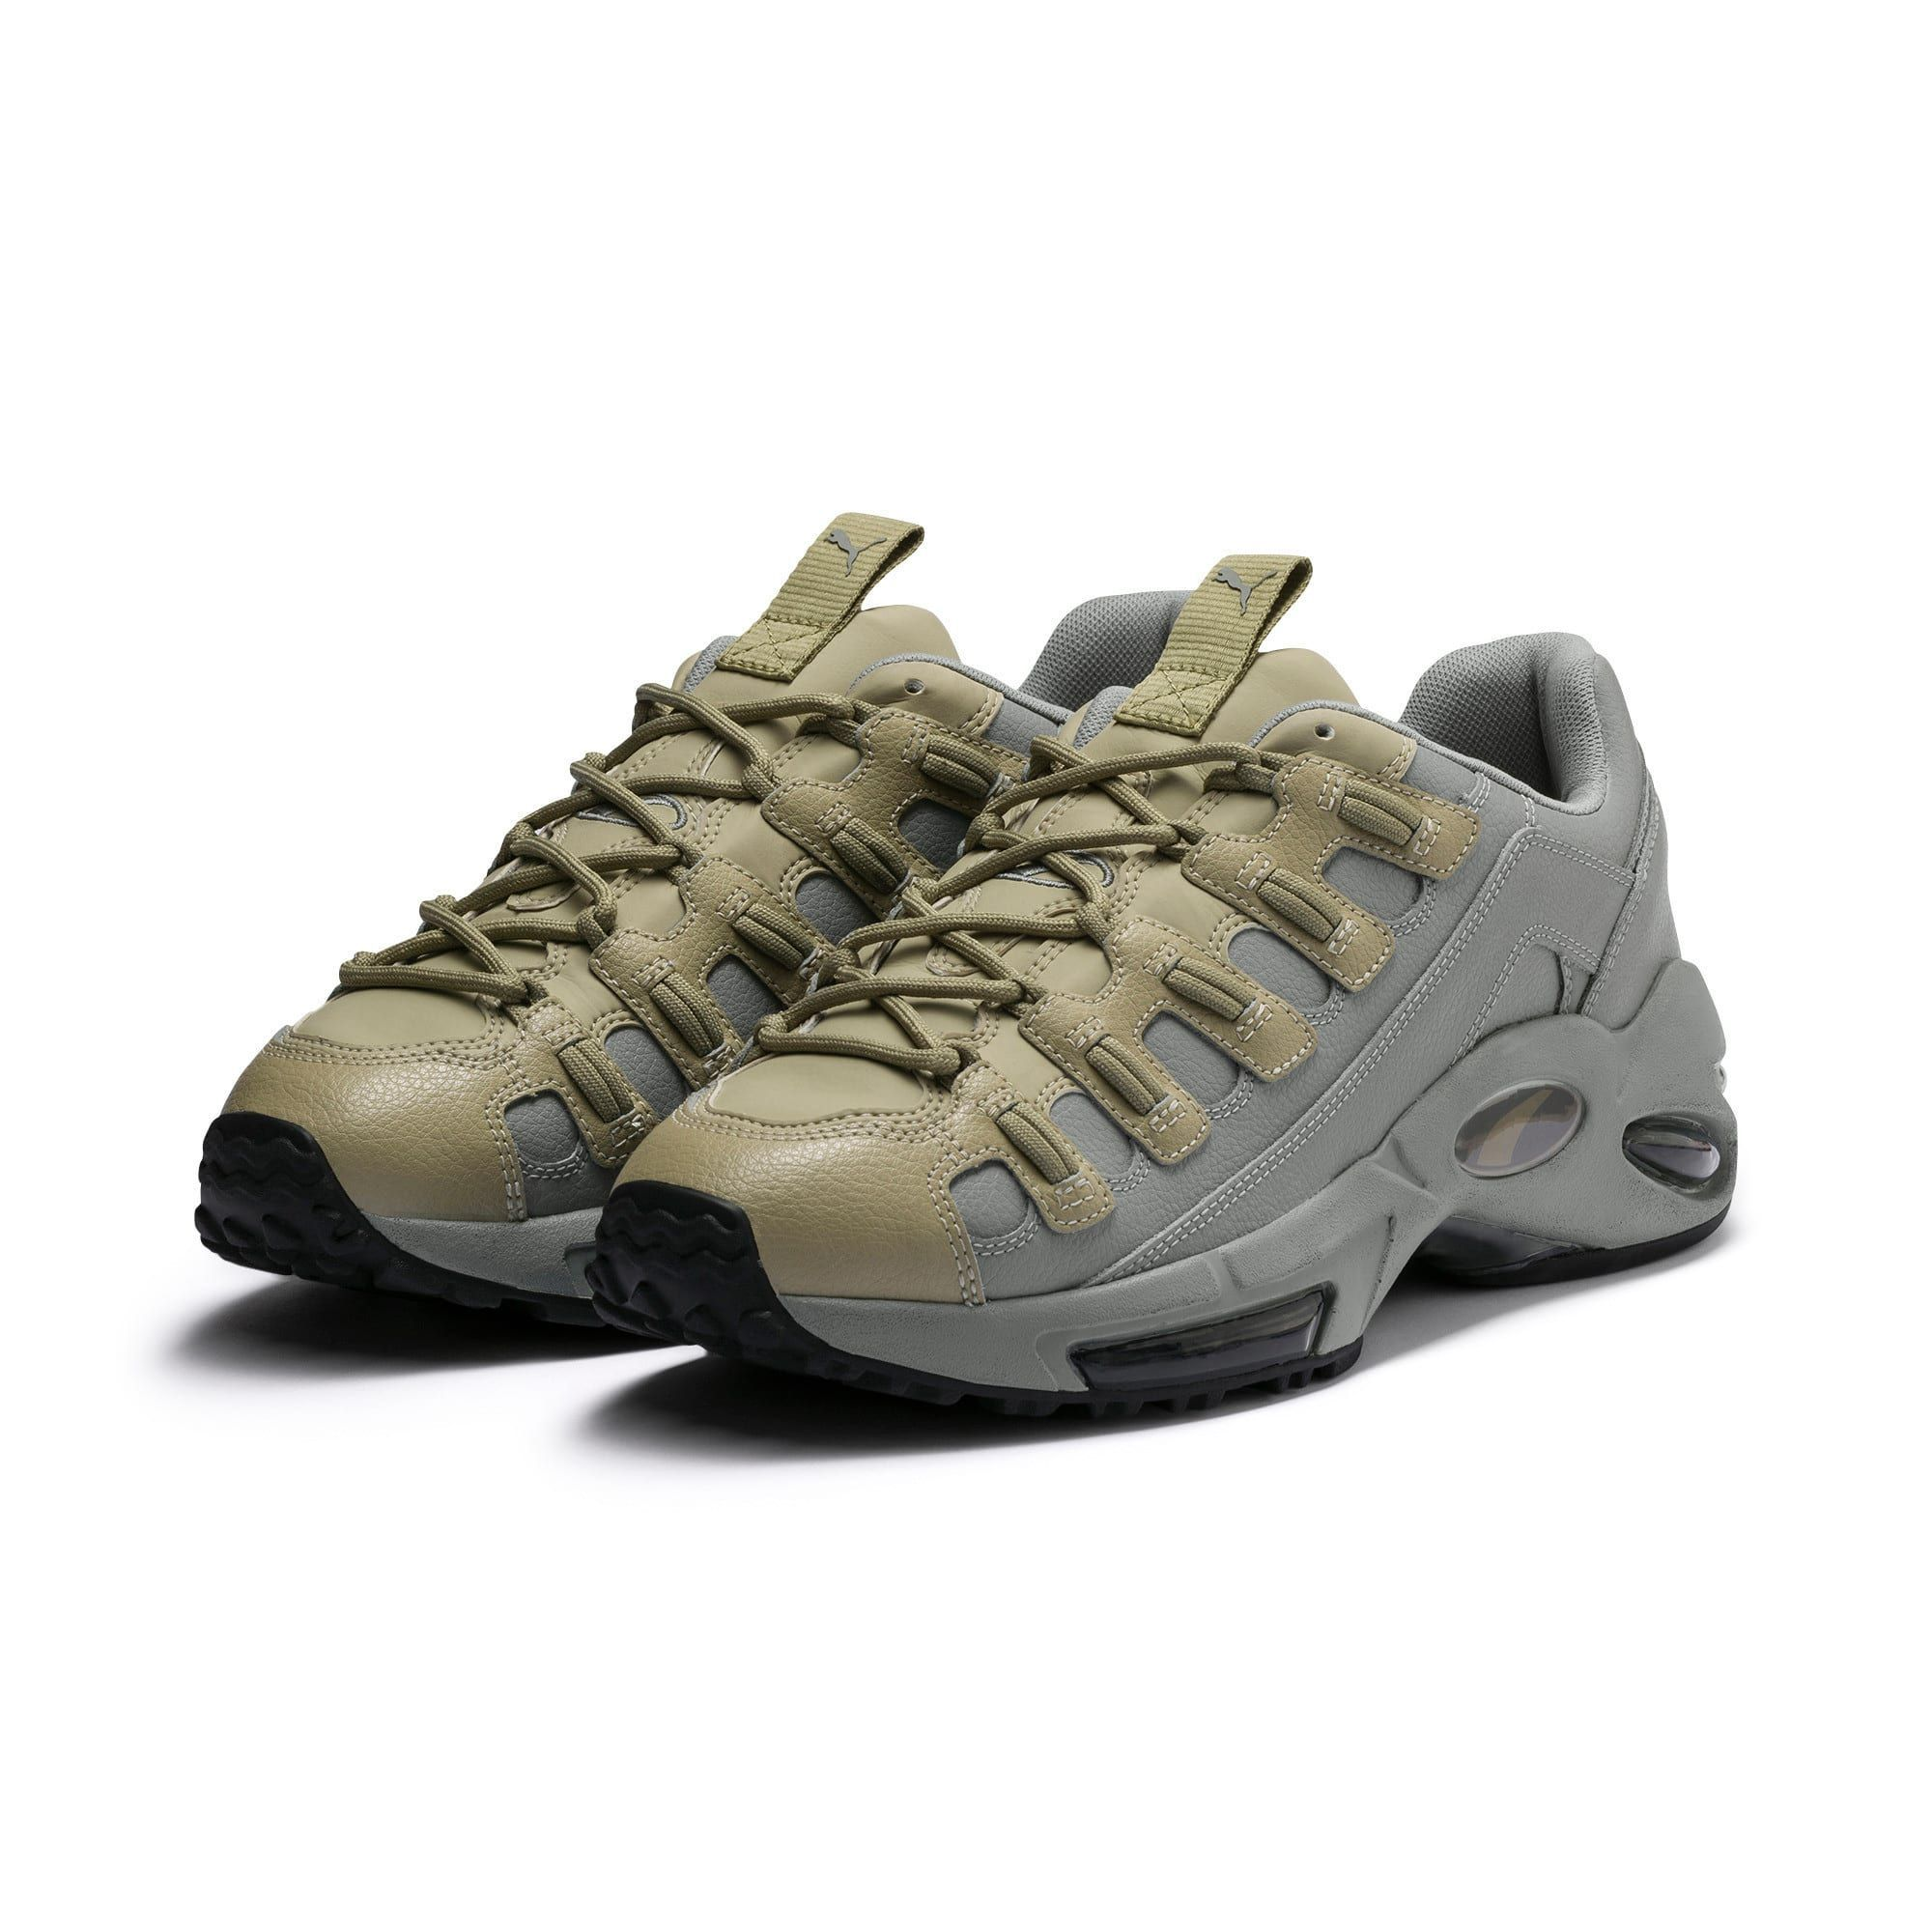 PUMA Chaussure Basket Cell Endura Front Dupla pour Homme Vert ...